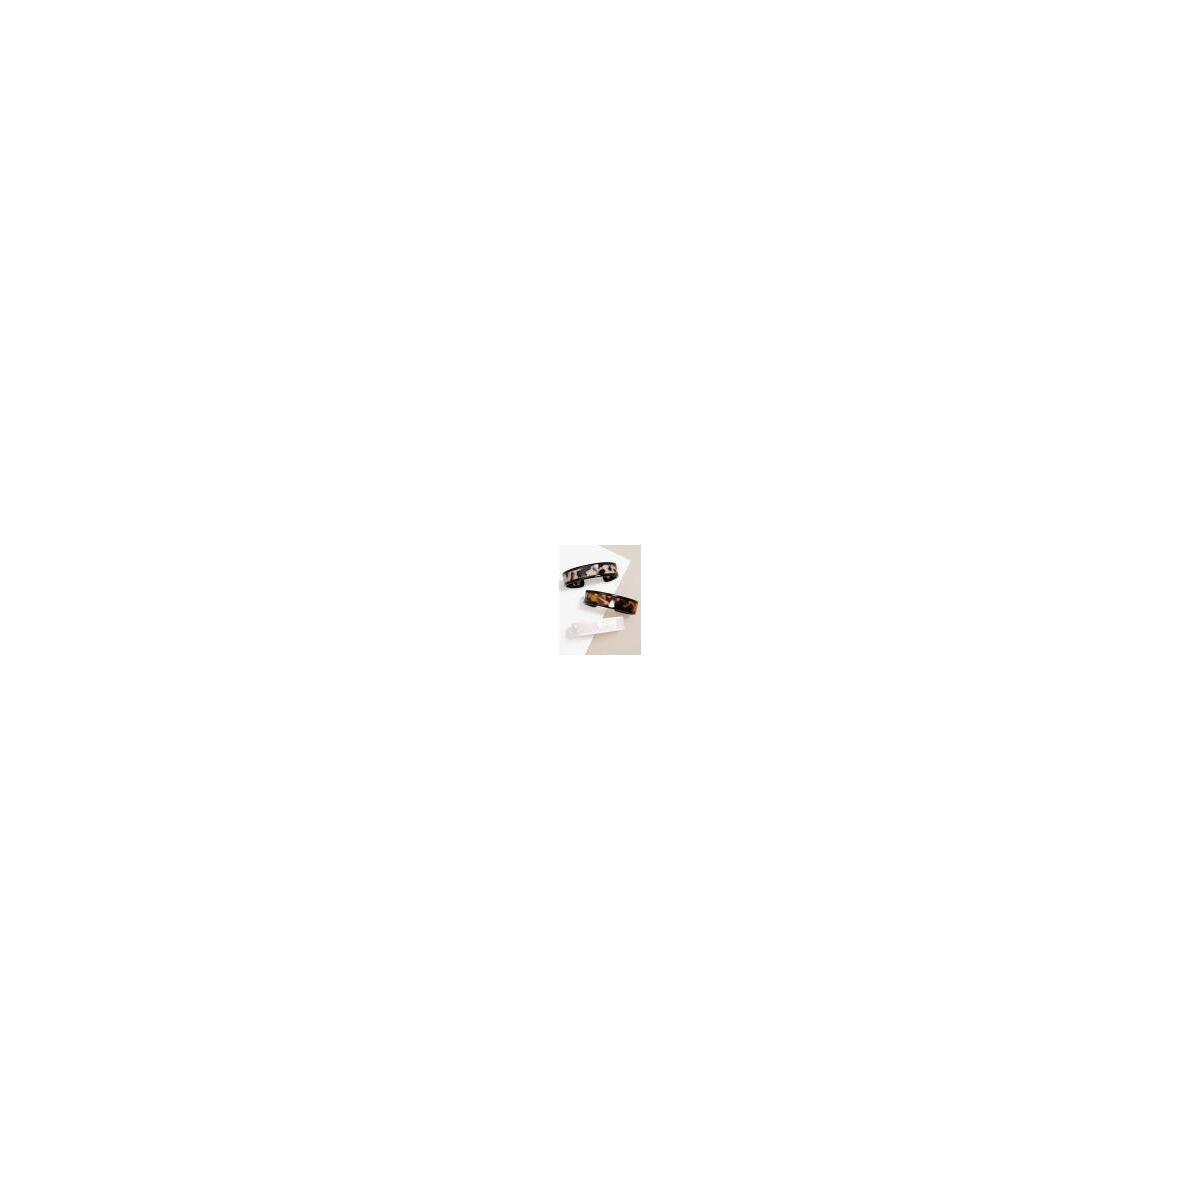 Skinny Lined Tortoise Cuff Bracelet   Stylish Costume Jewelry, White